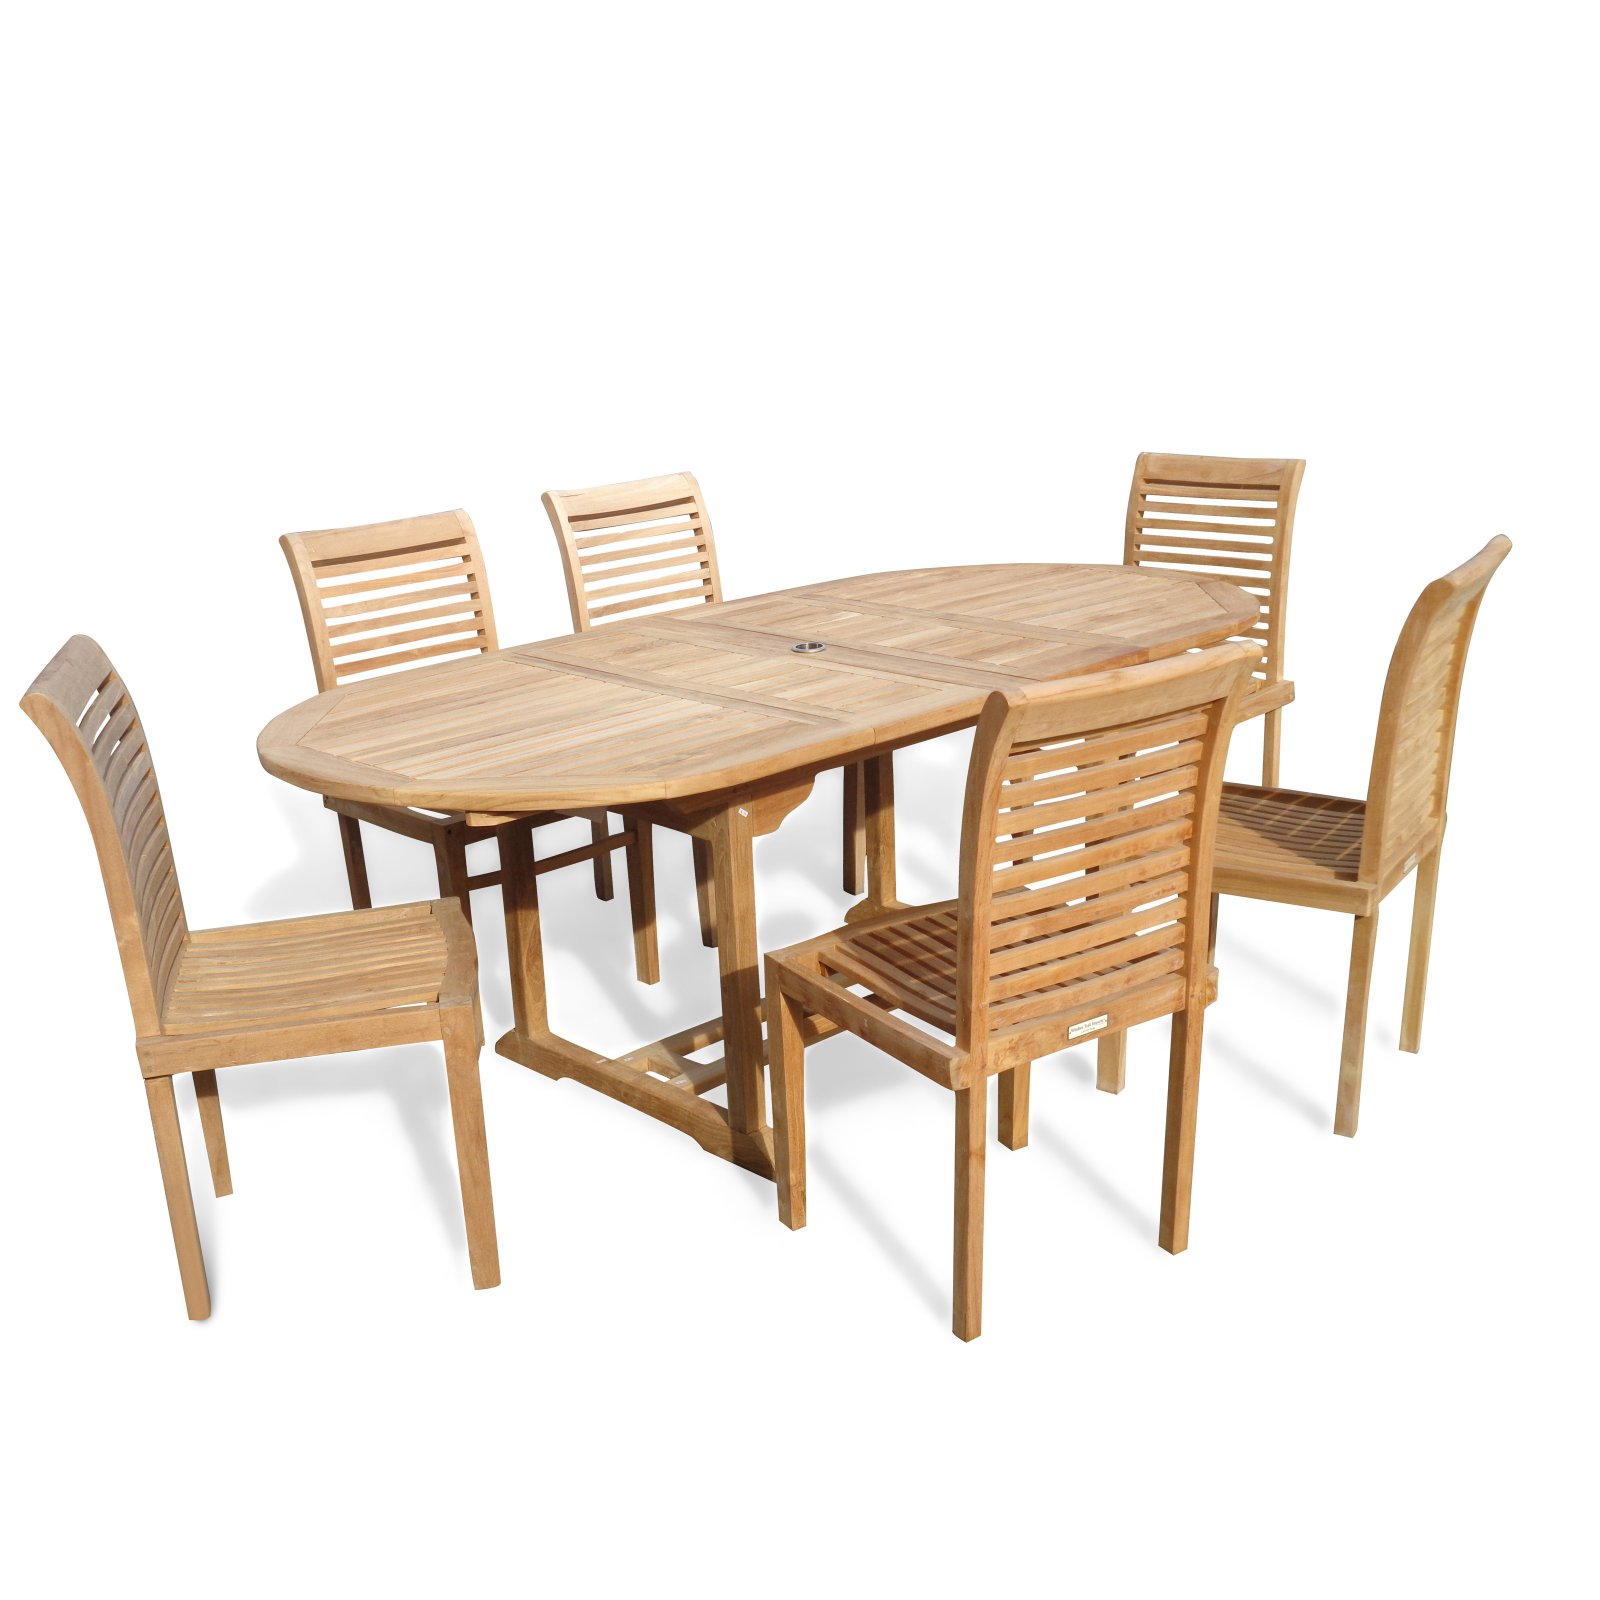 Windsor Teak Furniture Buckingham Double Extension Teak 7 Piece Outdoor Dining Room Set by Windsor Teak Furniture